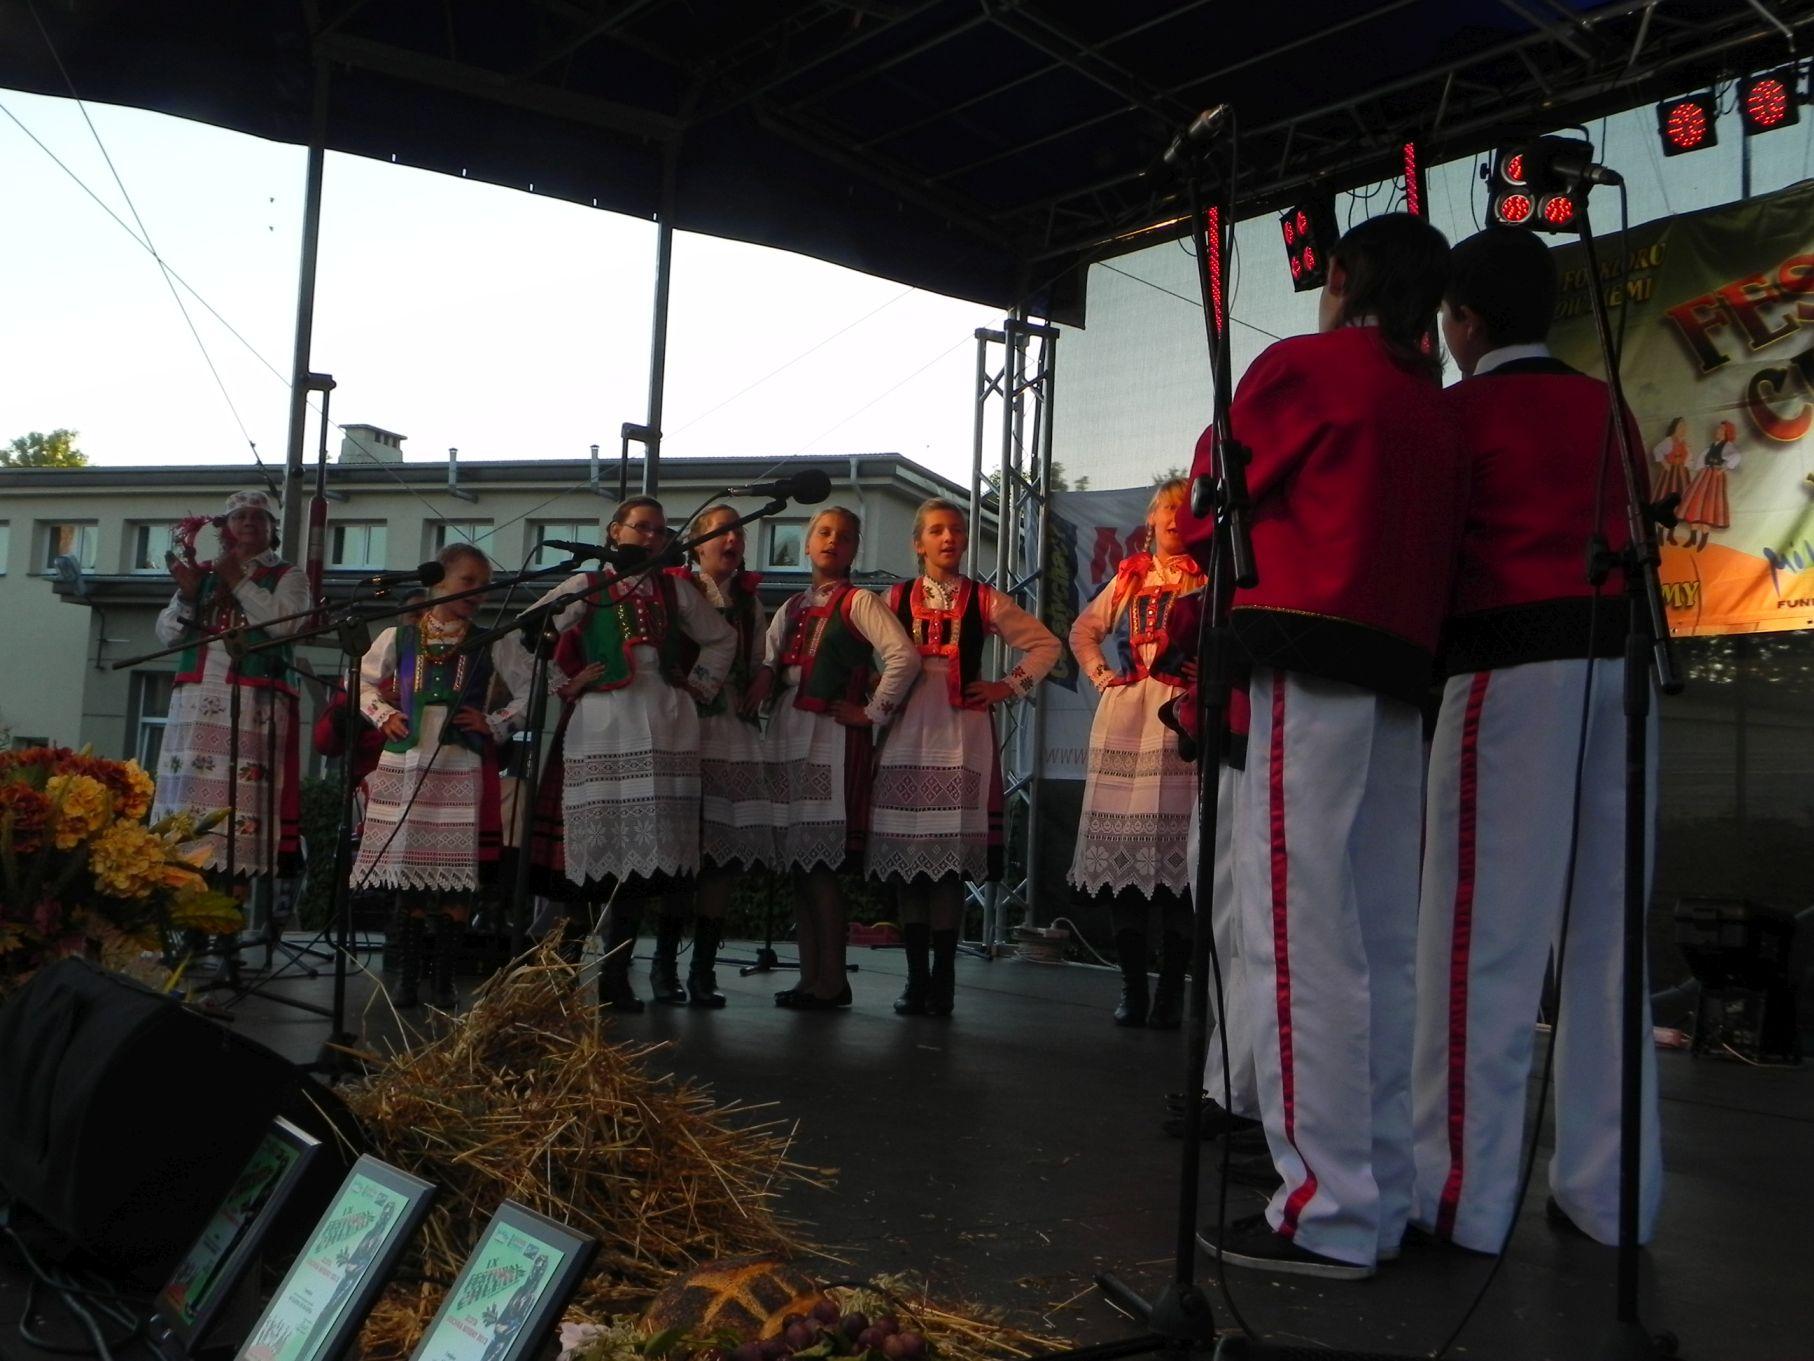 2013-09-10 Festyn - Mińsk Maz (164)